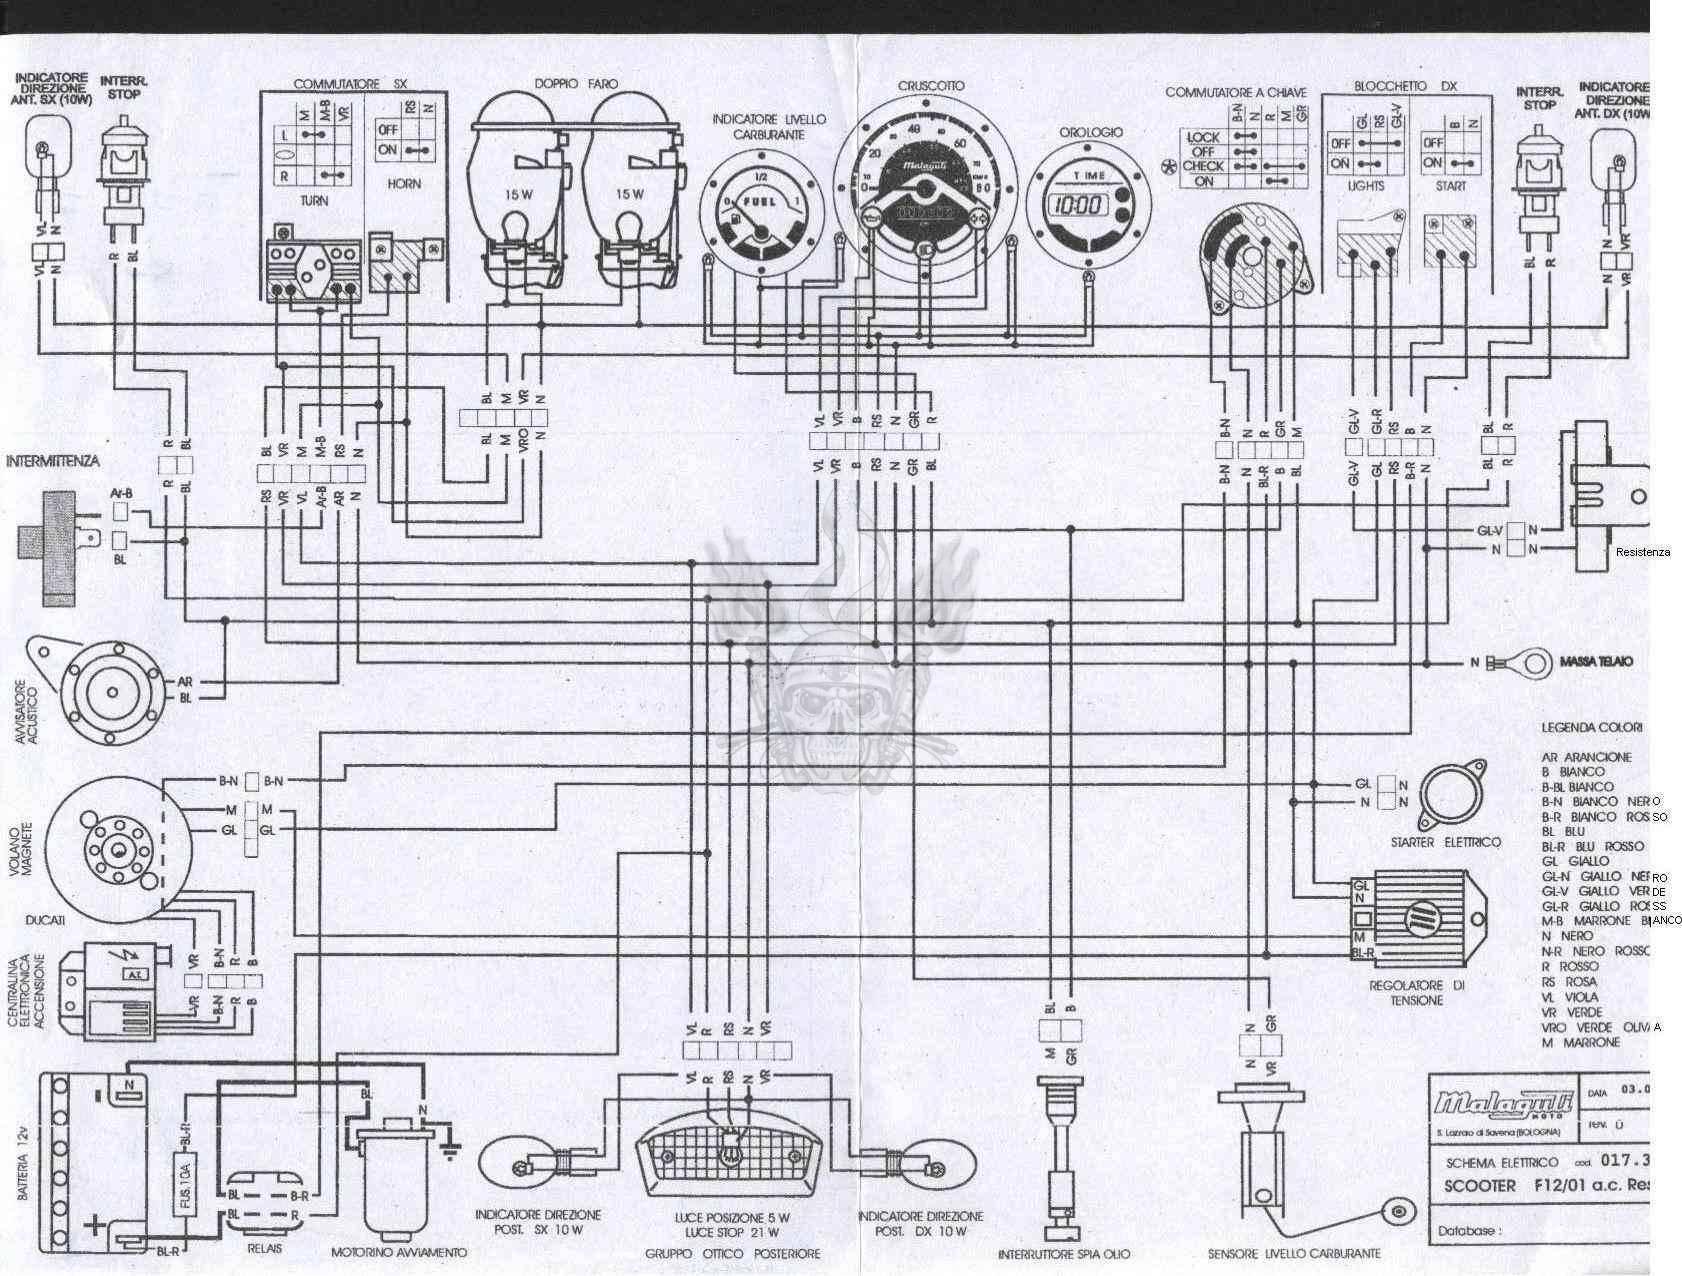 Boeing 777 Wiring Diagram Manual. Boeing 747-400 Diagram, Boeing 747 on boeing 720 diagram, atr 42 diagram, boeing 707 diagram, general aviation scale diagram, boeing 787 diagram, mcdonnell douglas f-15 eagle diagram, boeing 747 wingspan length, douglas dc-2 diagram, gulfstream g550 diagram, boeing 727 diagram, boeing b-17 flying fortress diagram, boeing 757 diagram, eurofighter typhoon diagram, sukhoi su-34 diagram, boeing 747-400 diagram, grumman a-6 intruder diagram, boeing 767 diagram, a330 diagram, f-111 aardvark diagram,